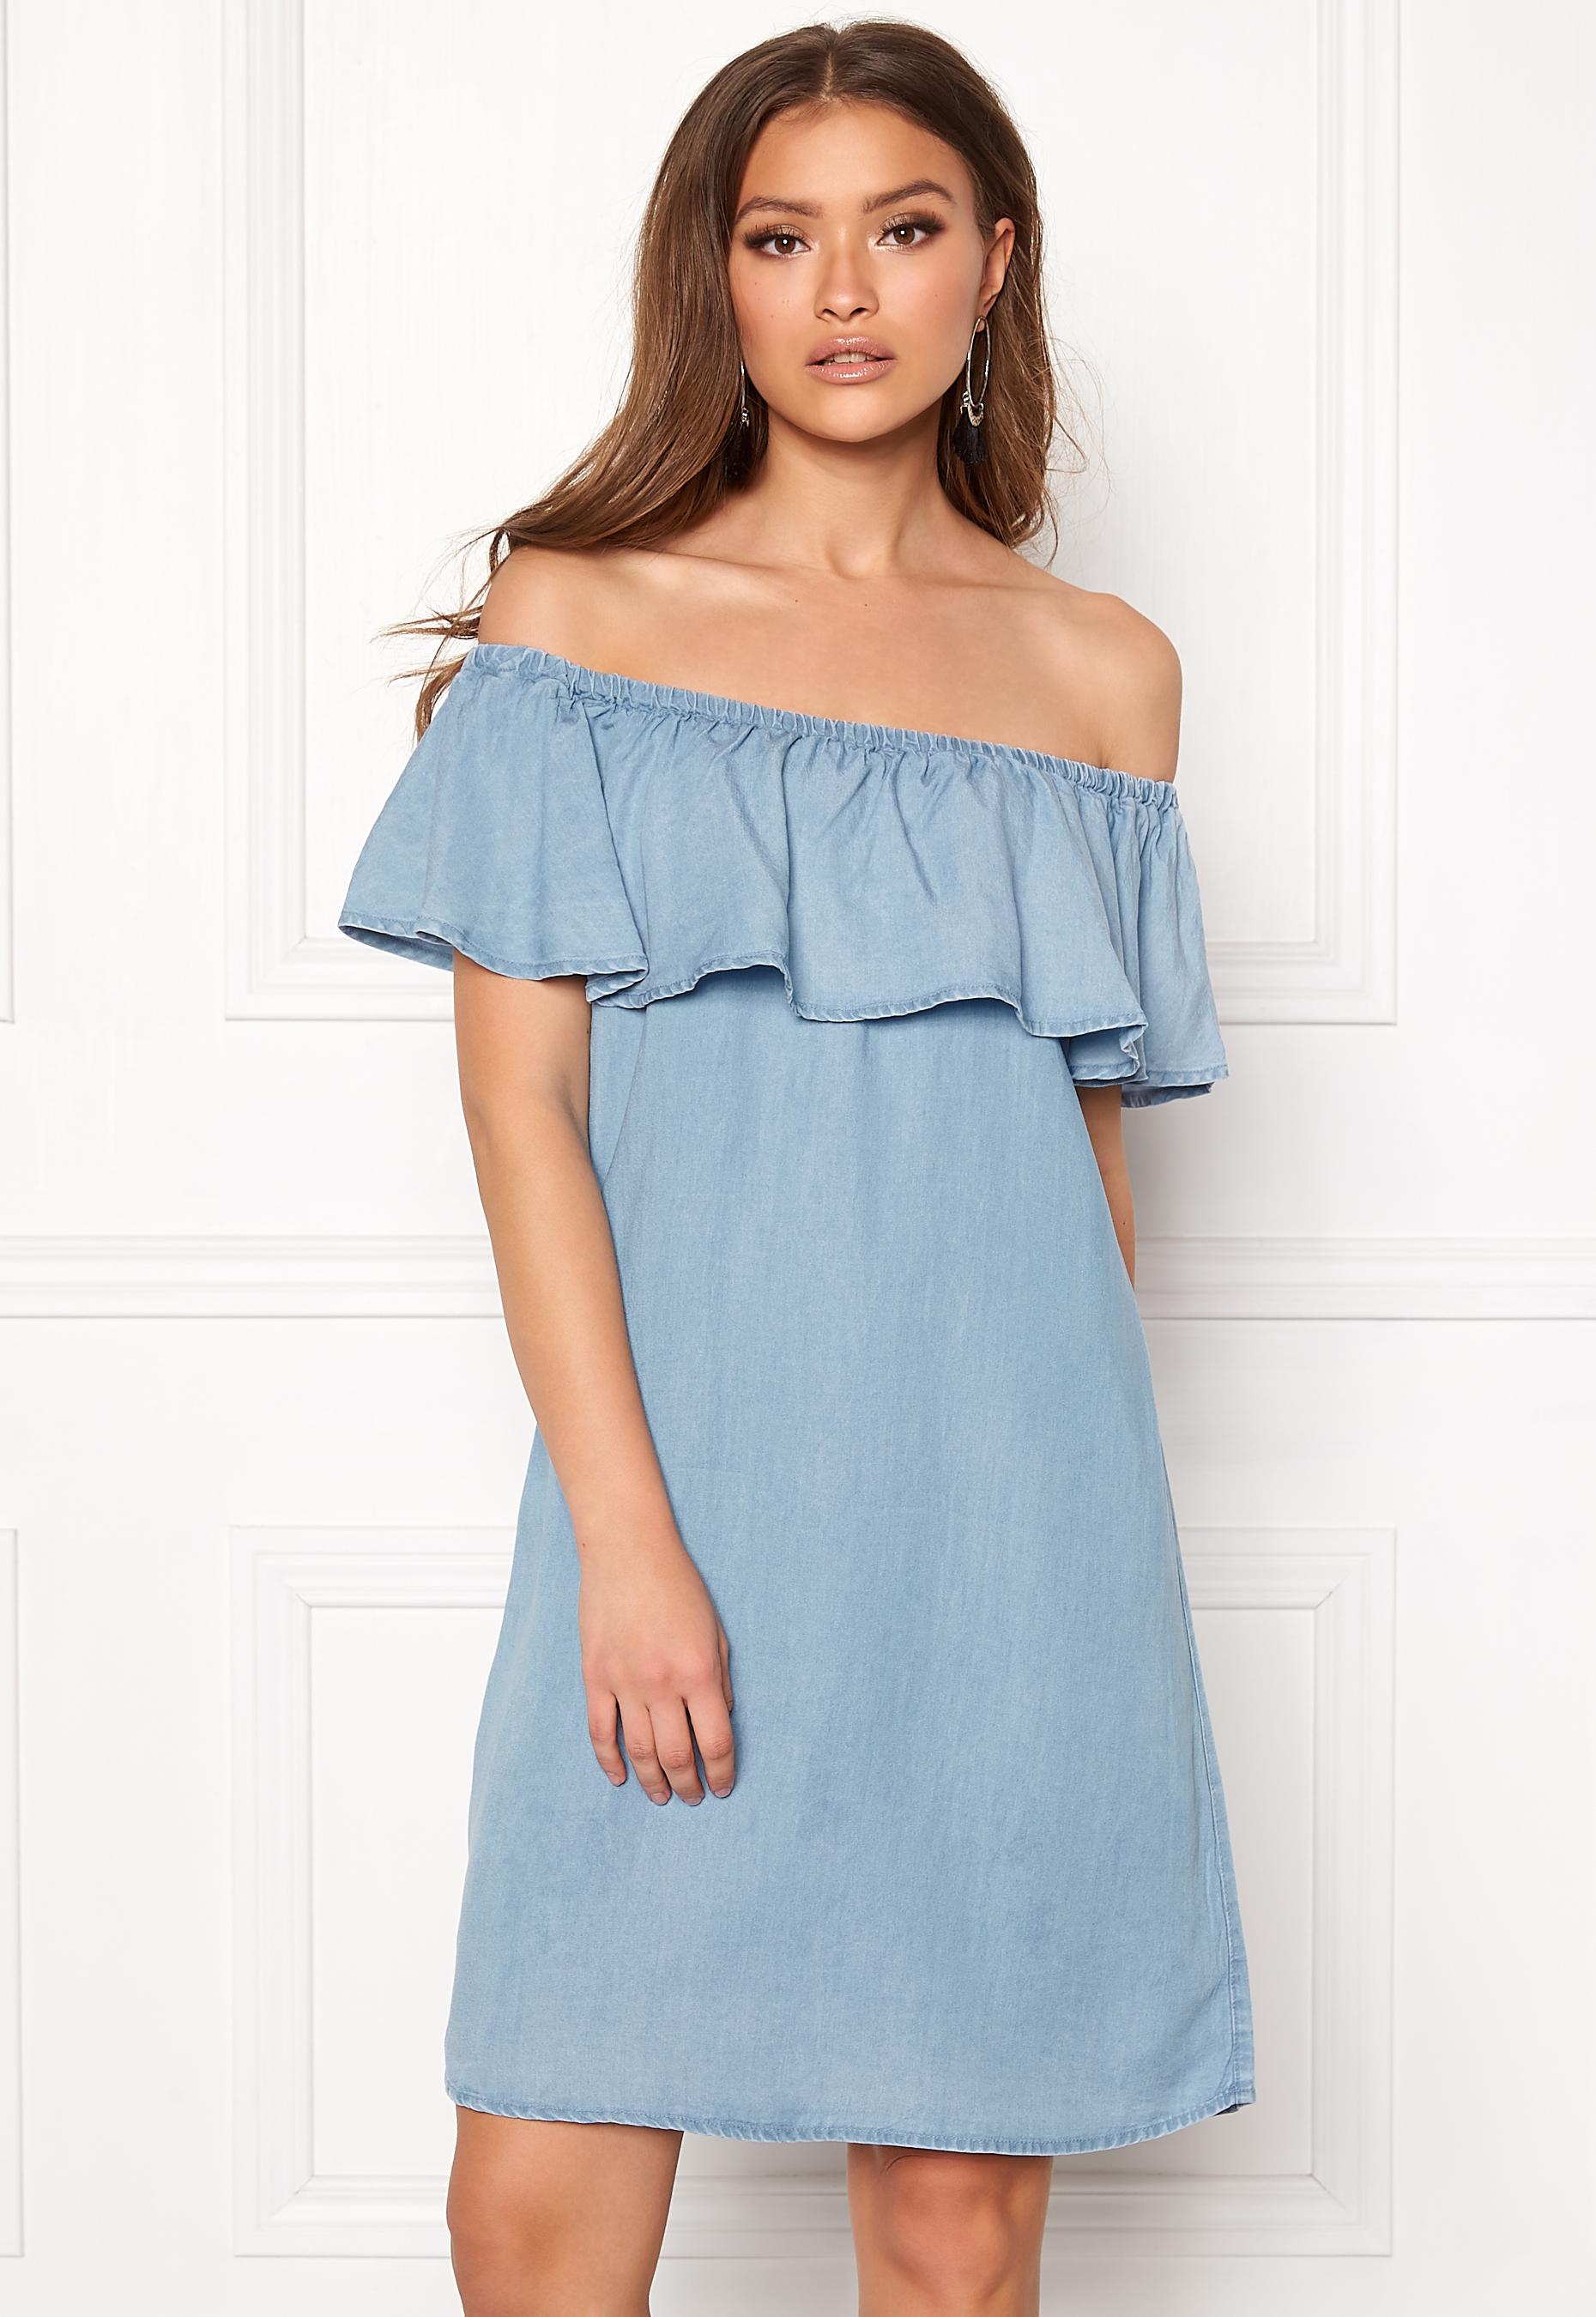 de9e227f VILA Gia Off Shoulder Dress Light Blue Denim - Bubbleroom